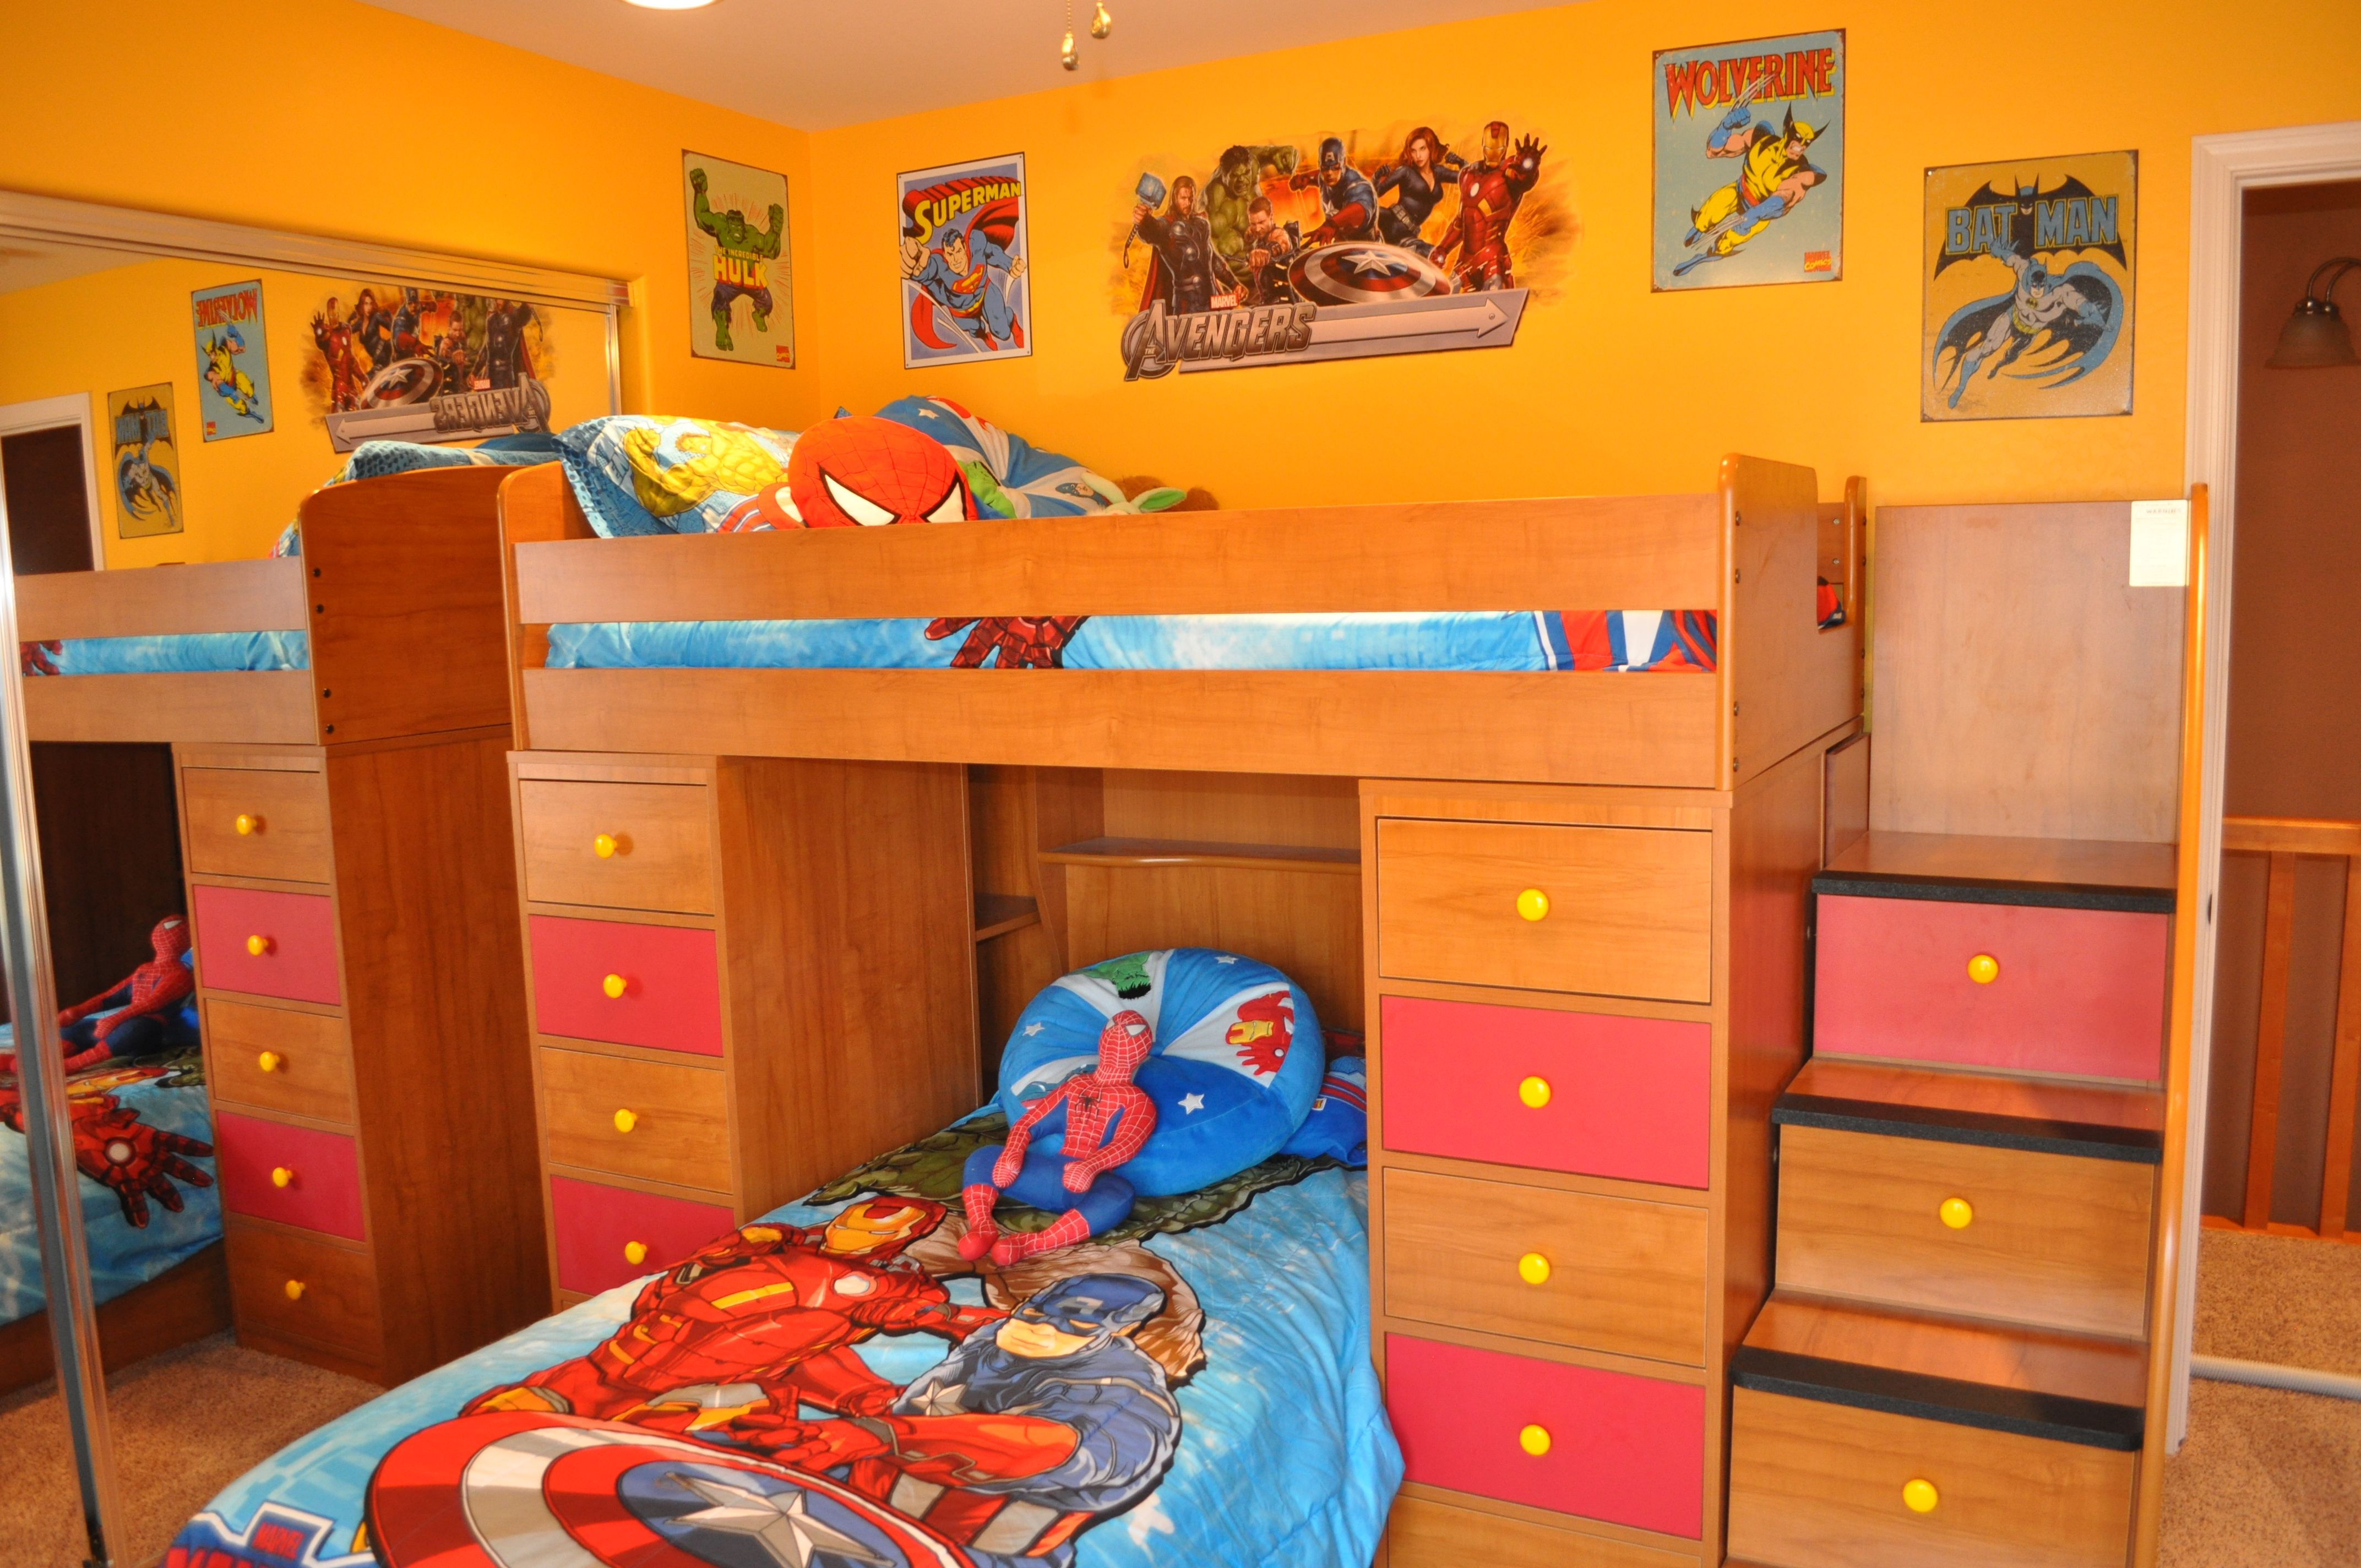 Disney Avengers Superhero Bedroom Decorating Wwwmydisneylovecom